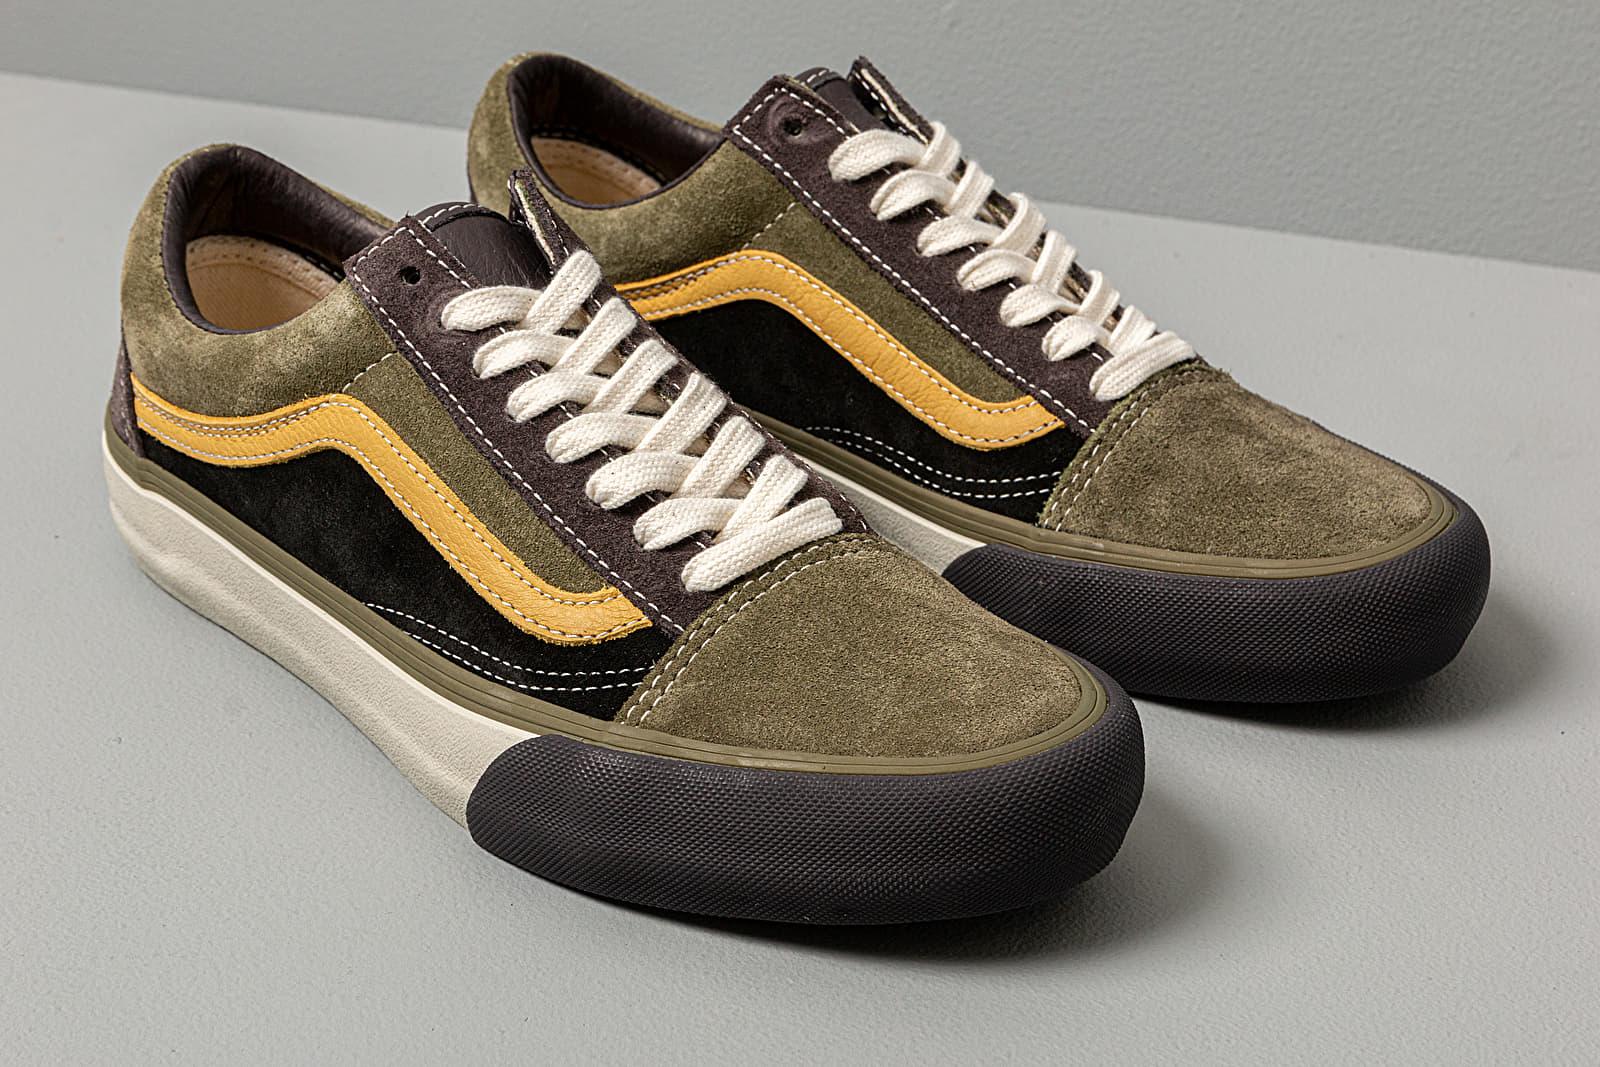 Vans Old Skool VLT LX (SuedeLeather) Shale Stone Gray | Footshop